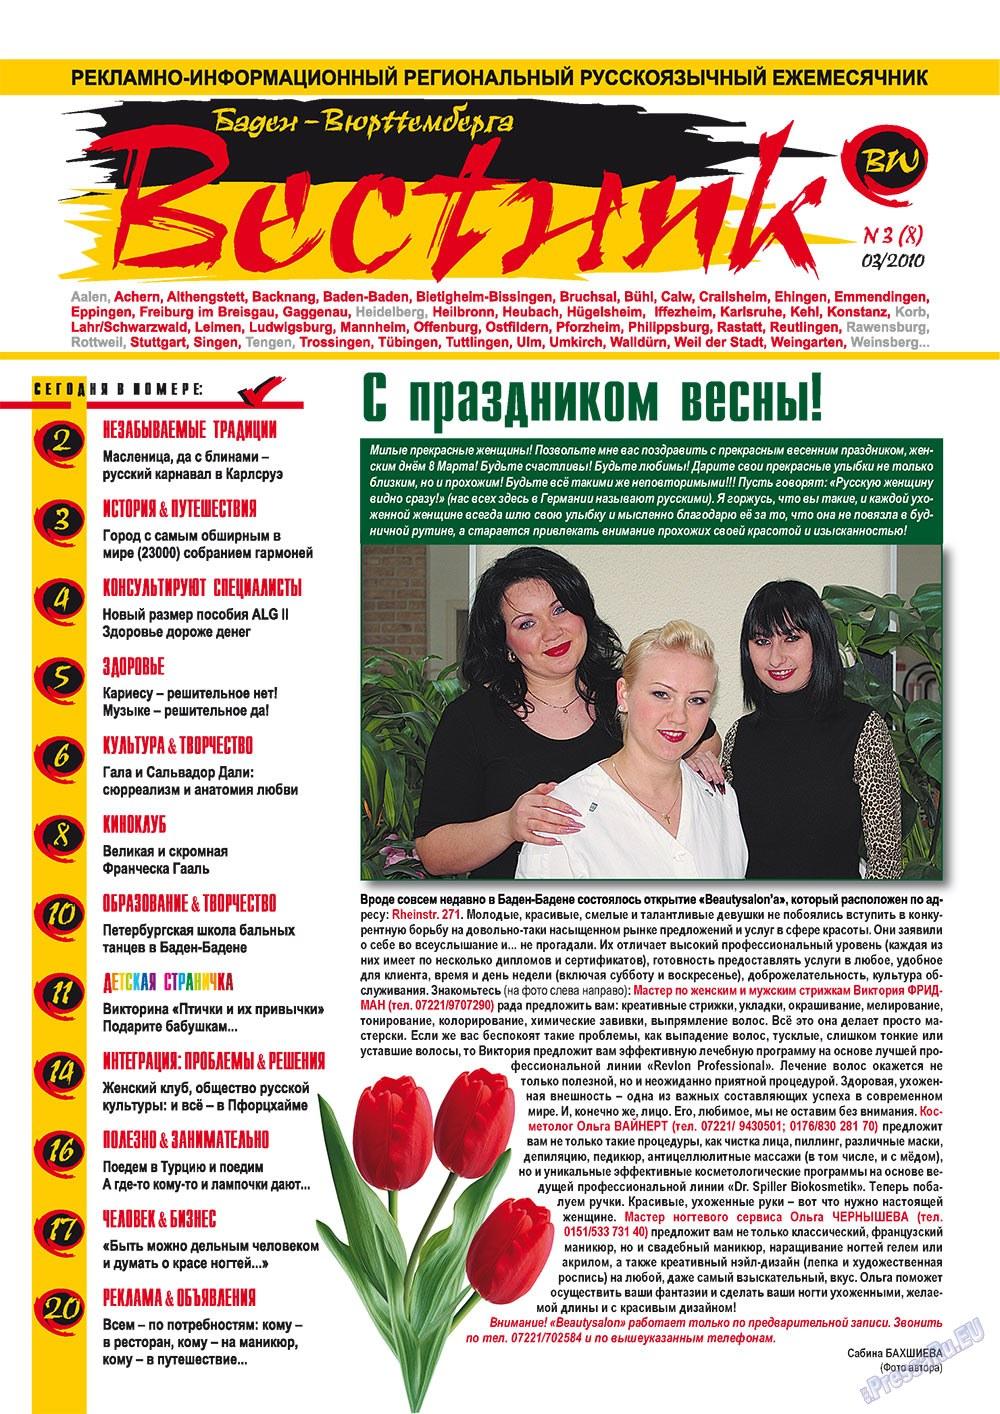 Вестник-info (журнал). 2010 год, номер 3, стр. 1